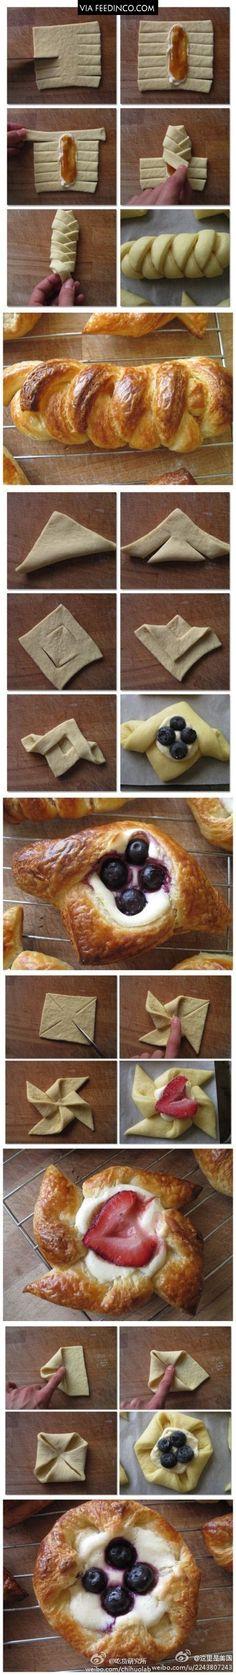 Pastry folding 101  check similar images on Feedinco.com